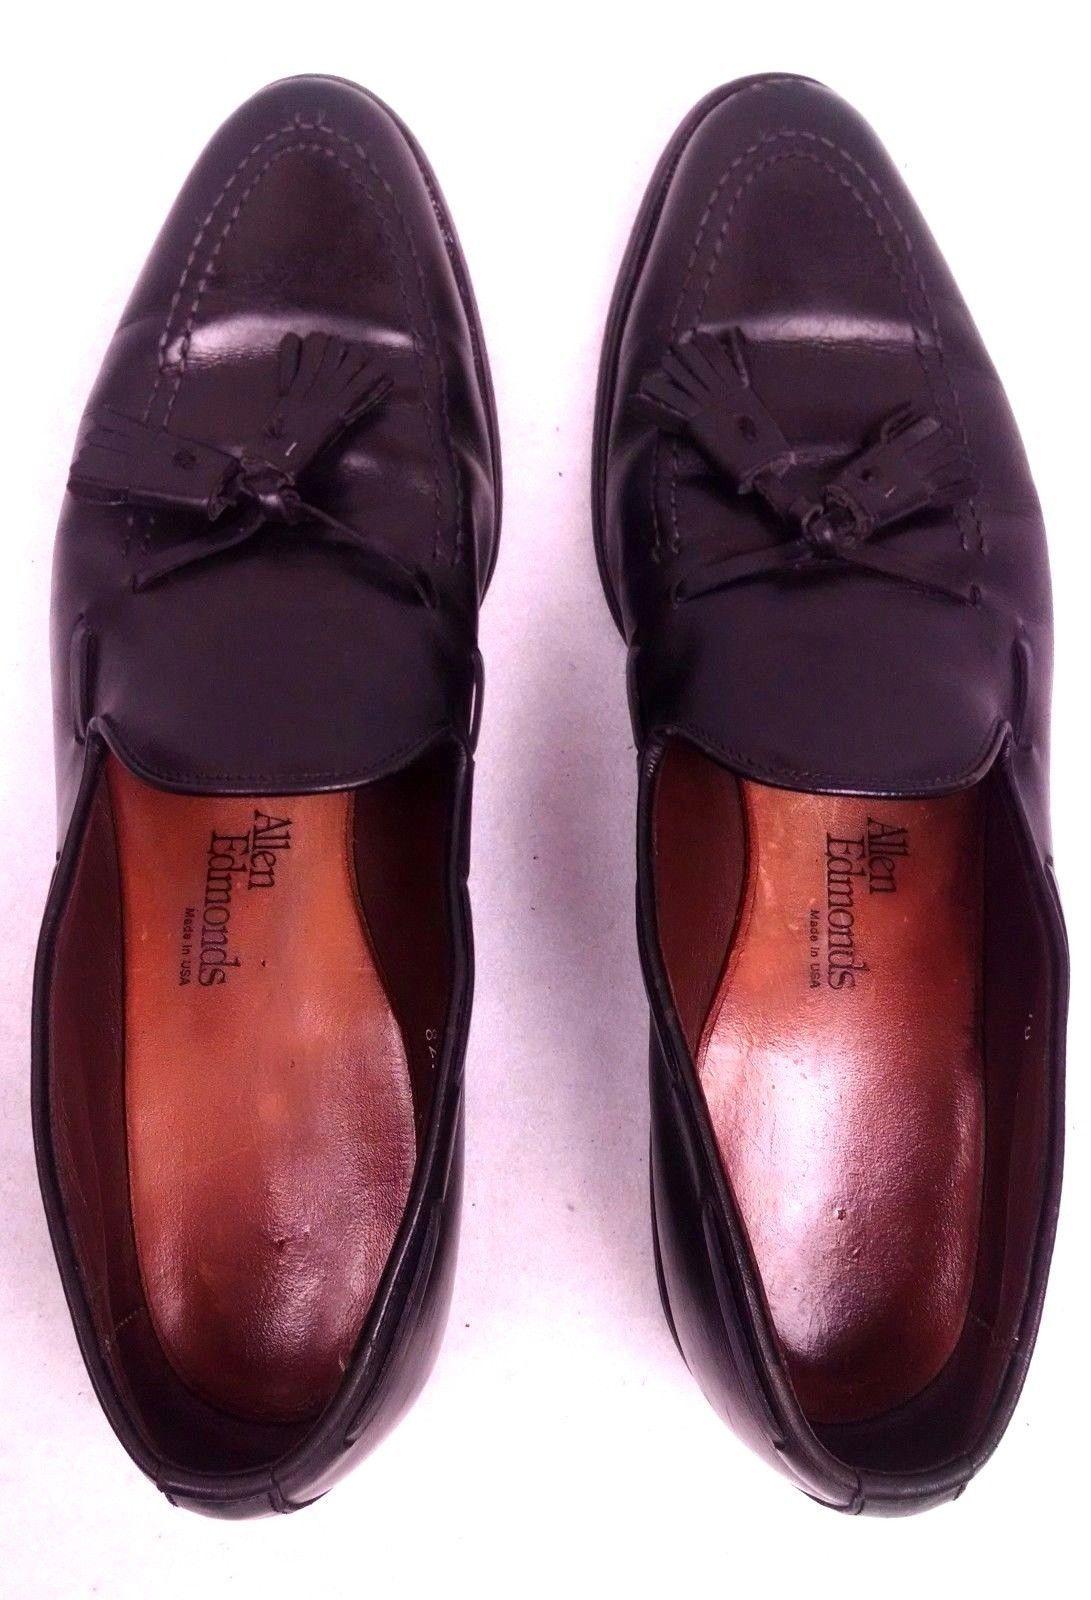 8f537e683a3 Allen Edmonds Grayson 8217 Dress Loafers Size 10 AA Black Custom Calf  Tassels